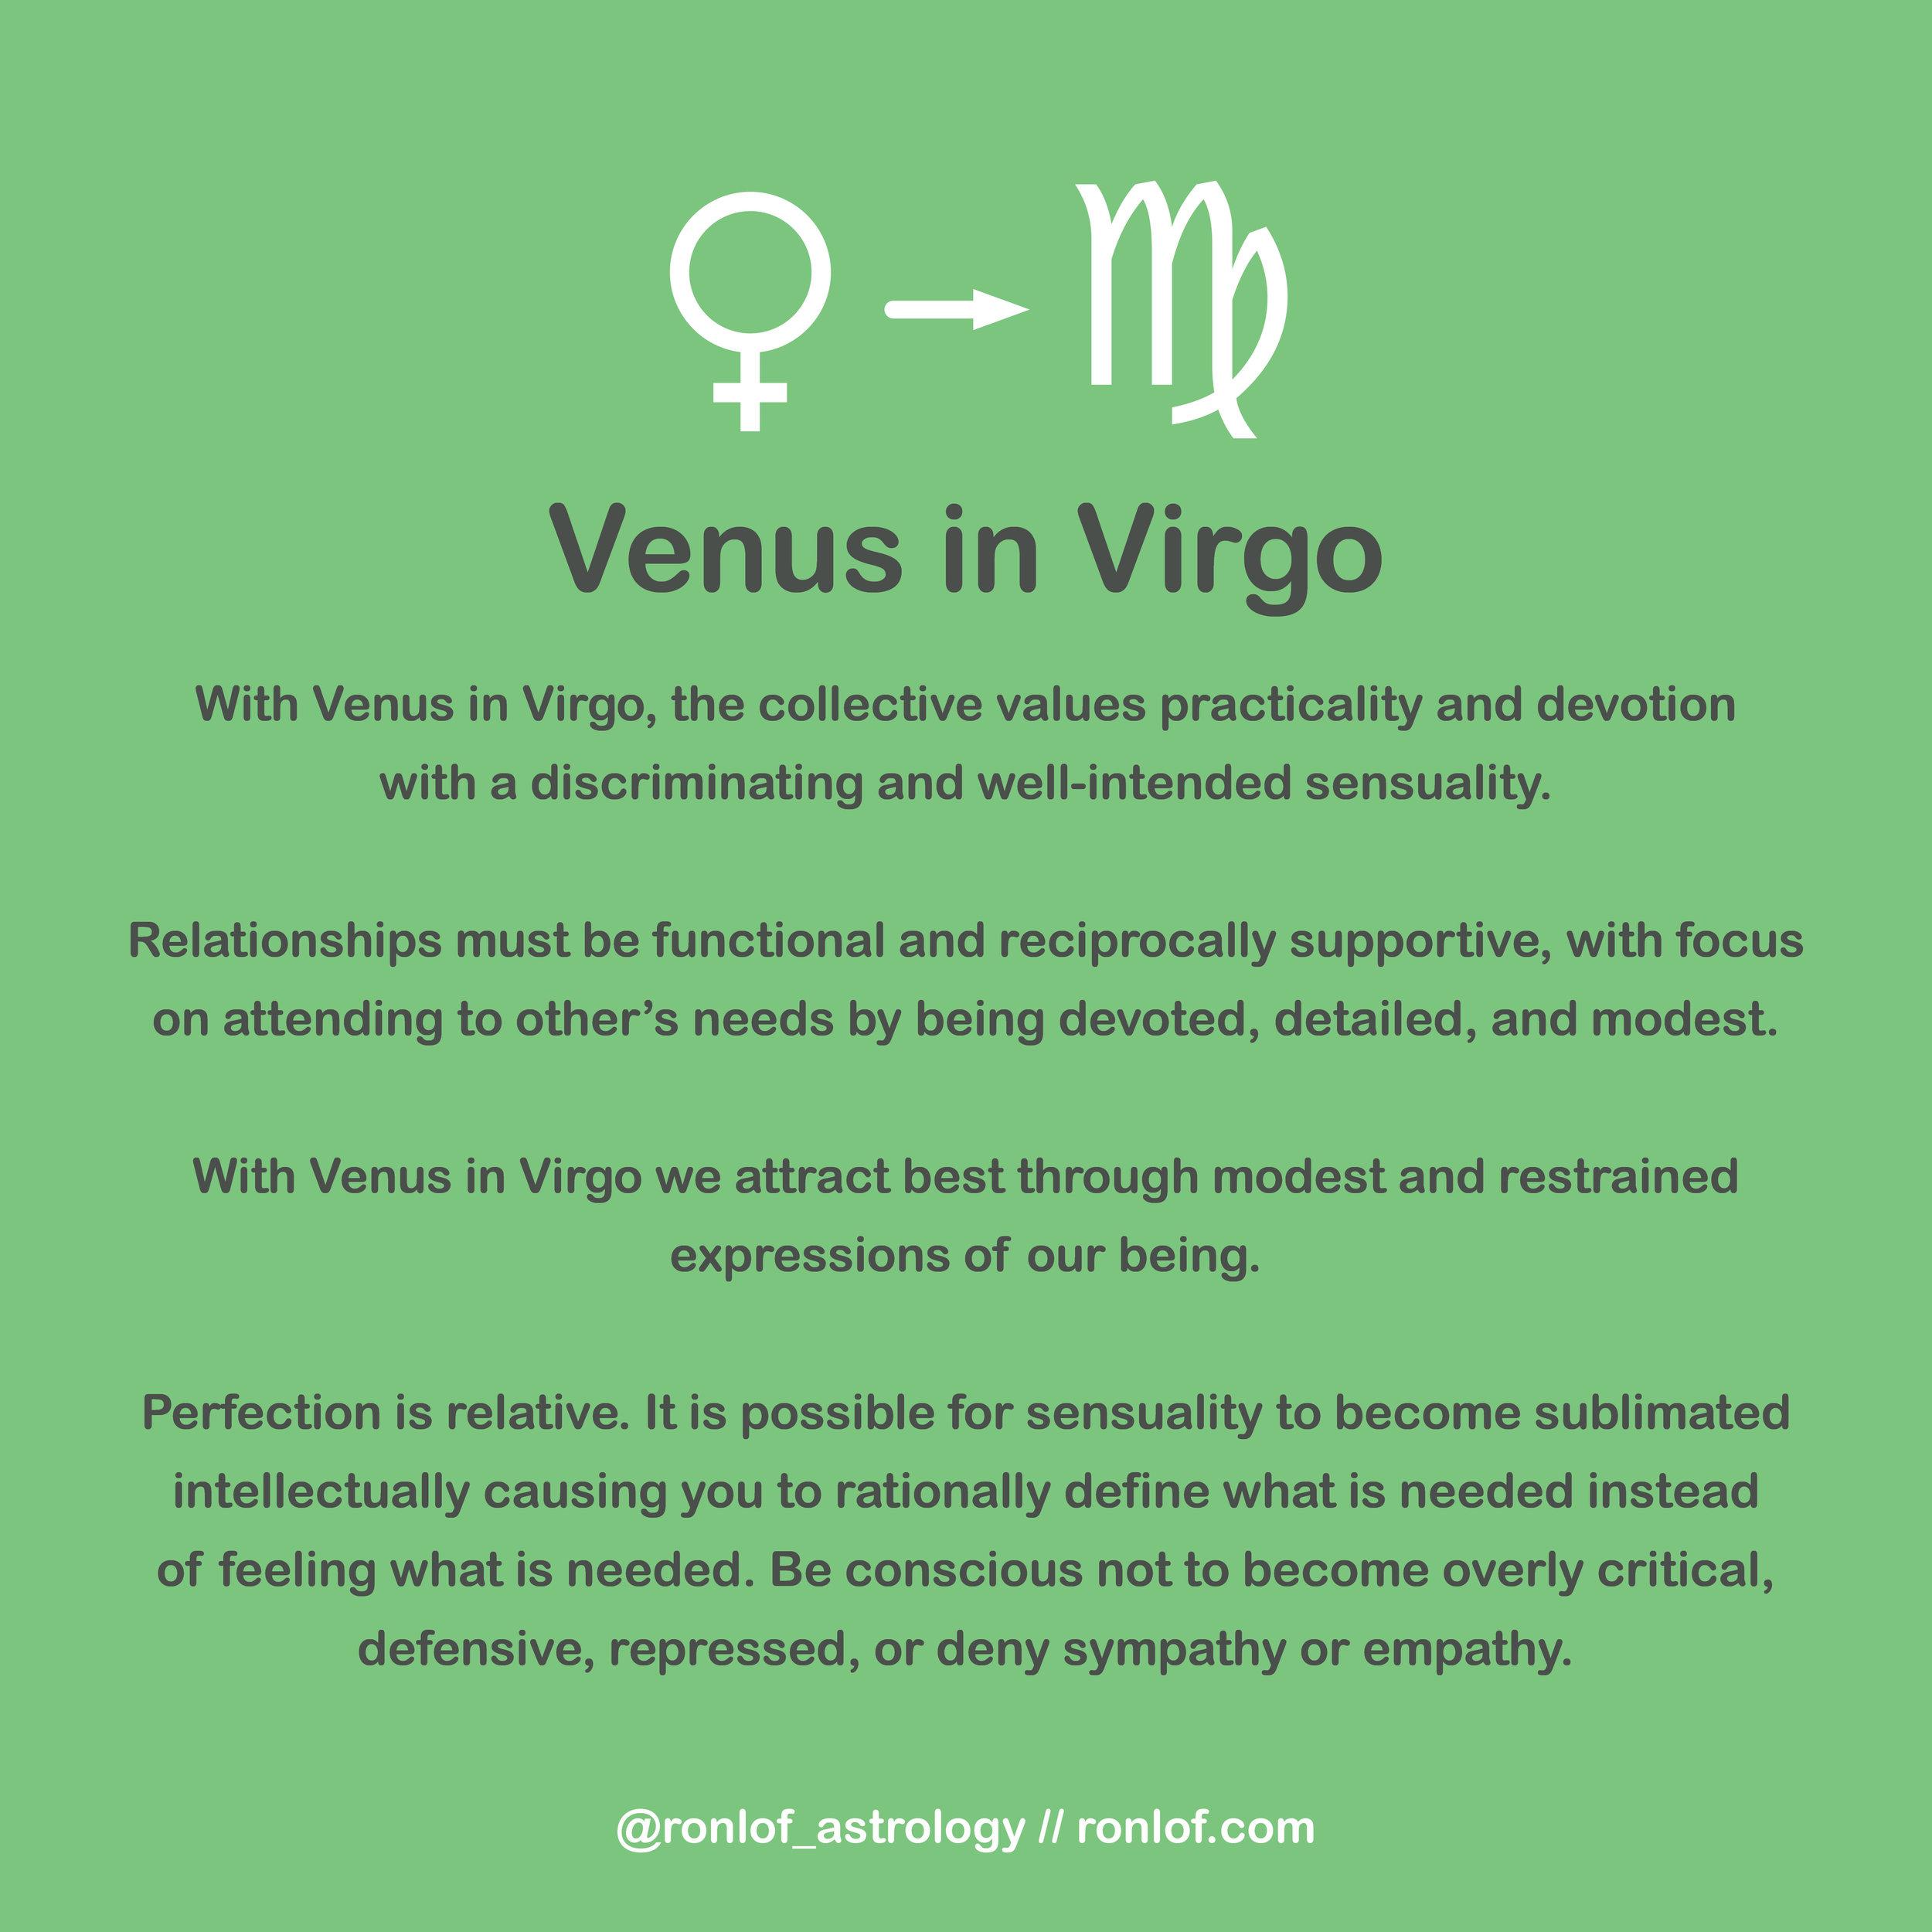 VenusVirgo3.jpg